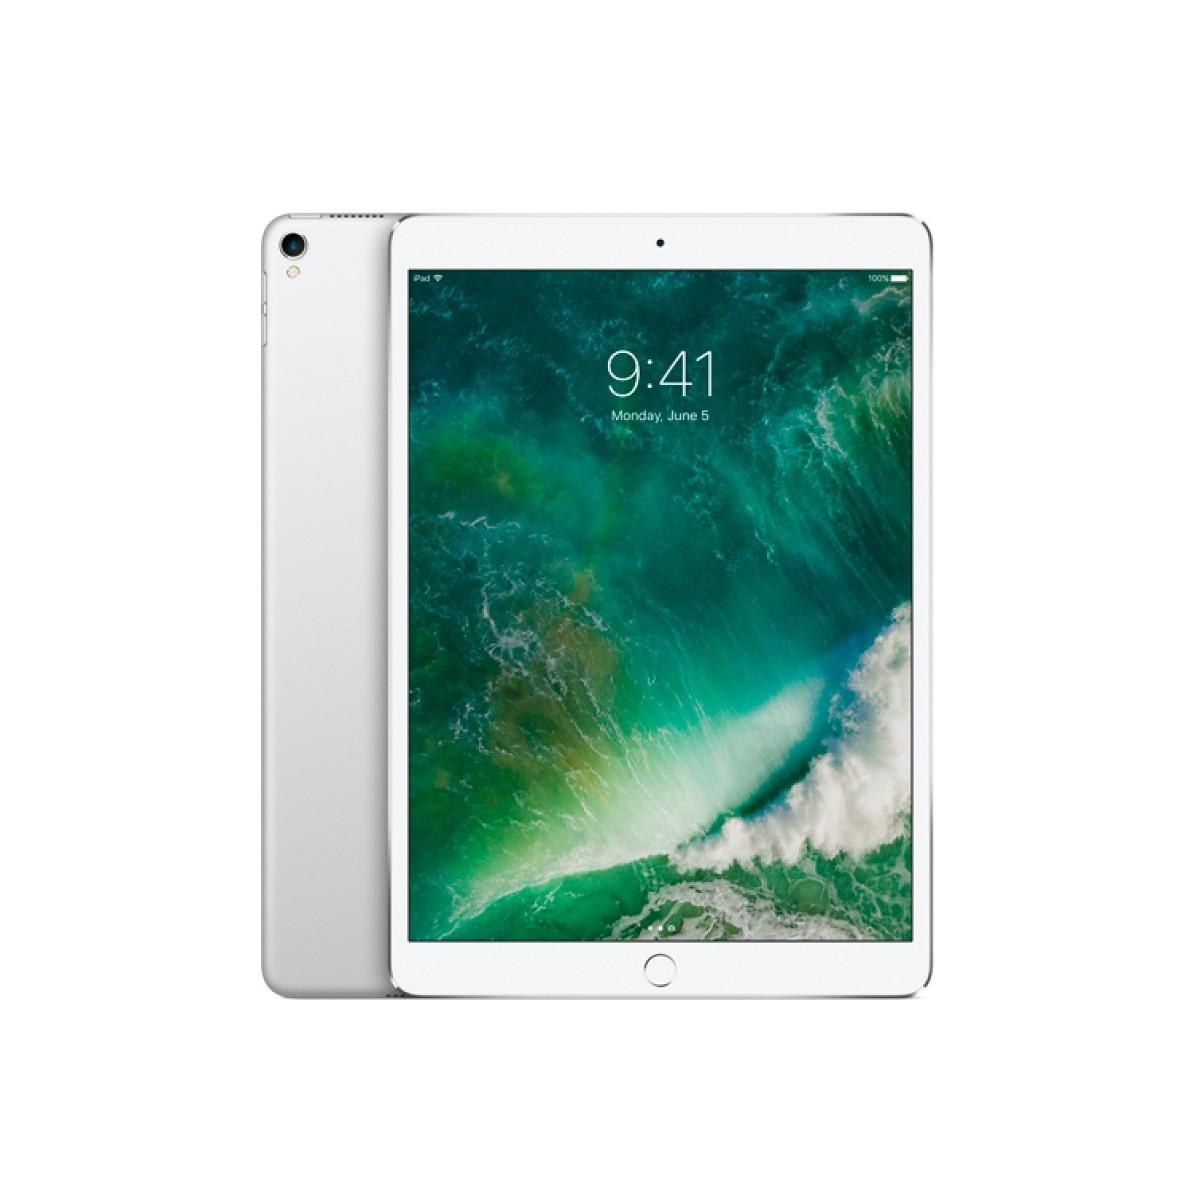 Apple iPad Pro 10.5 64Gb Wi-Fi Silver (MQDW2RK) 2017